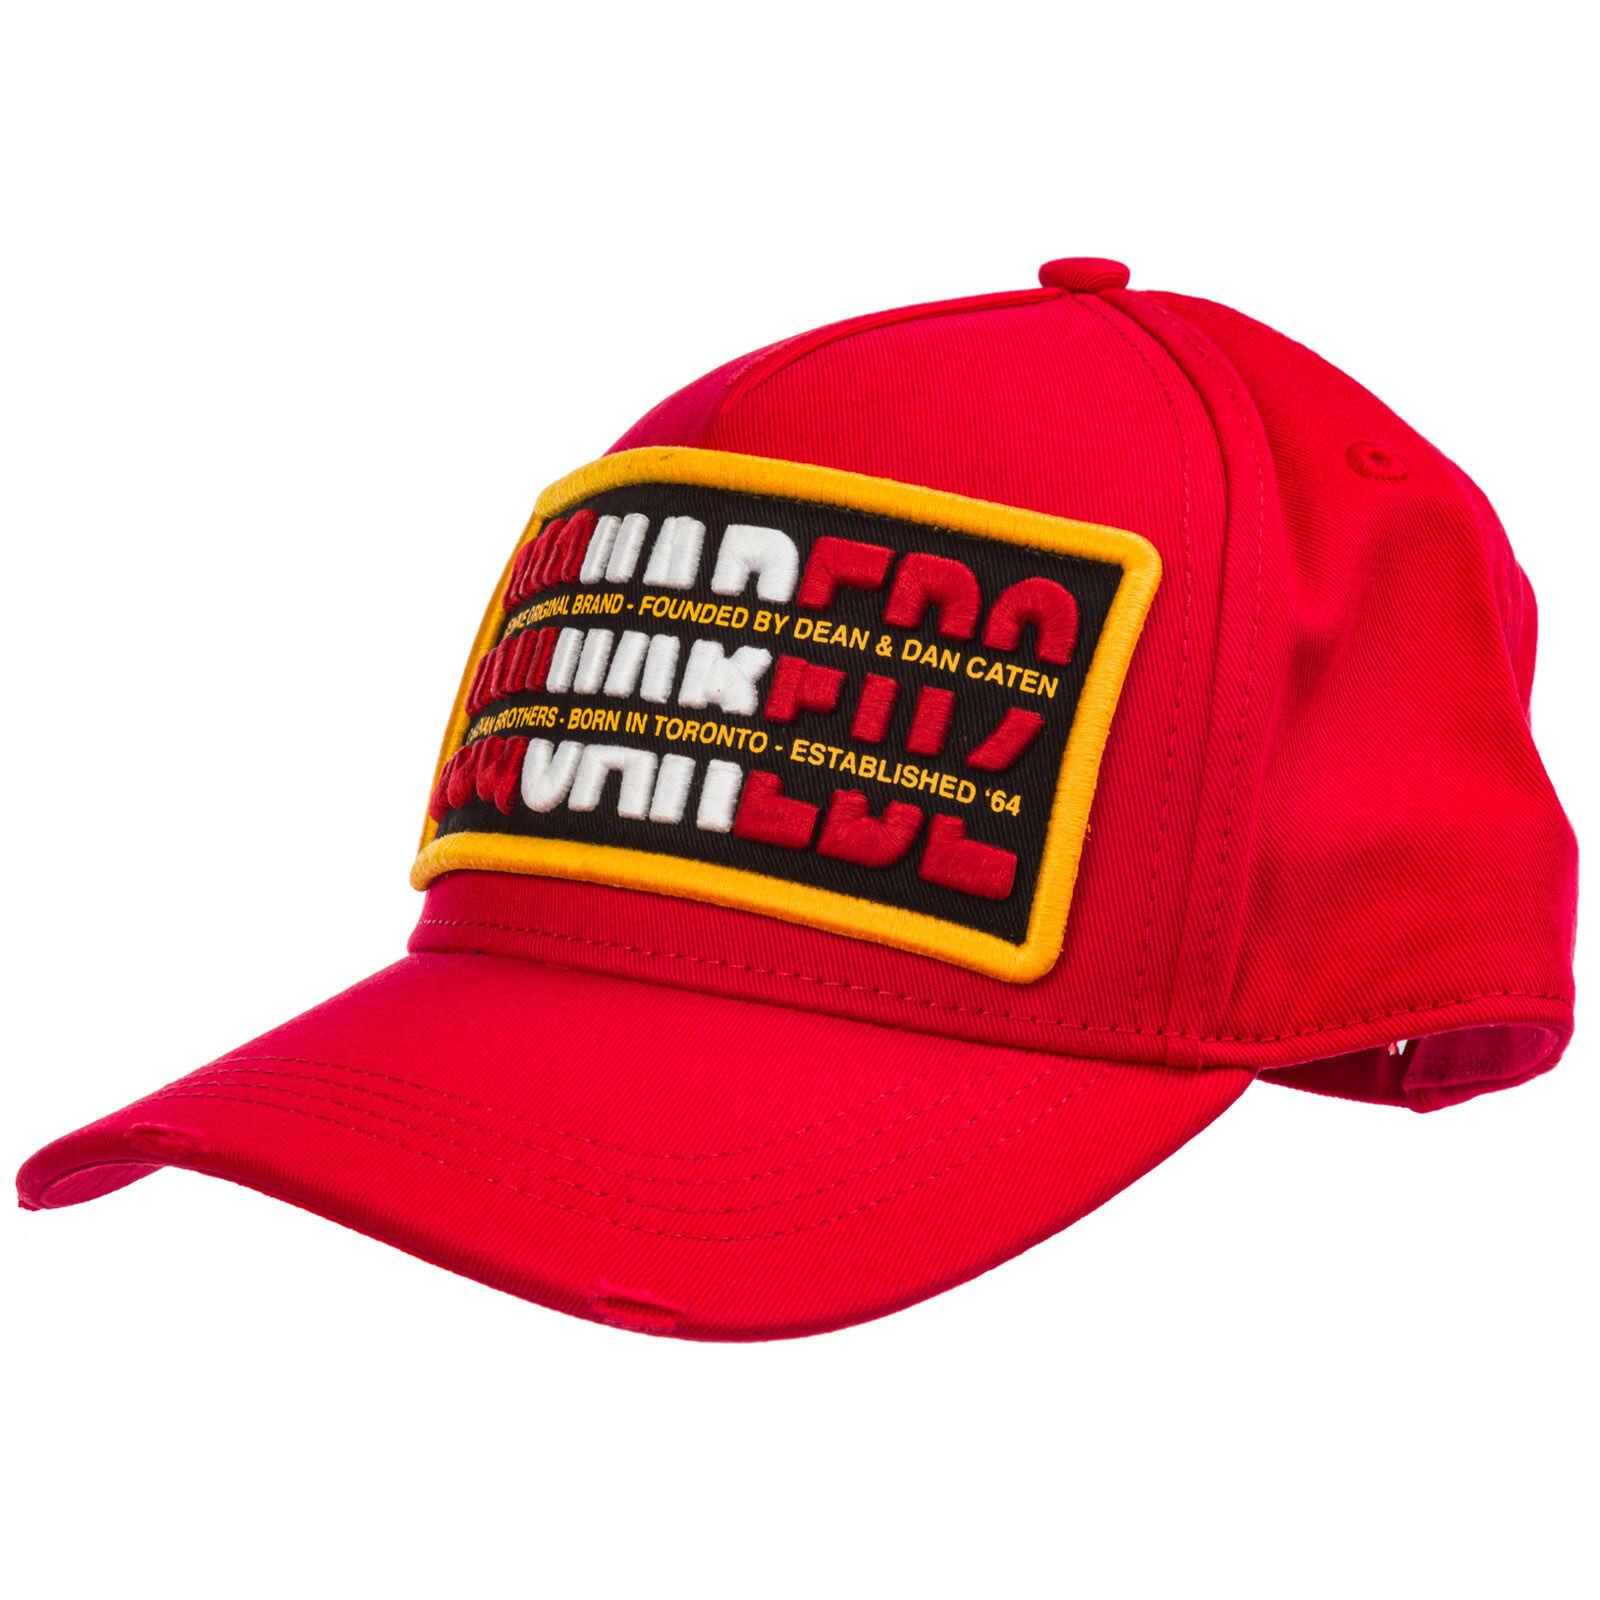 Dsquared2 Adjustable men's cotton hat baseball cap  - Red